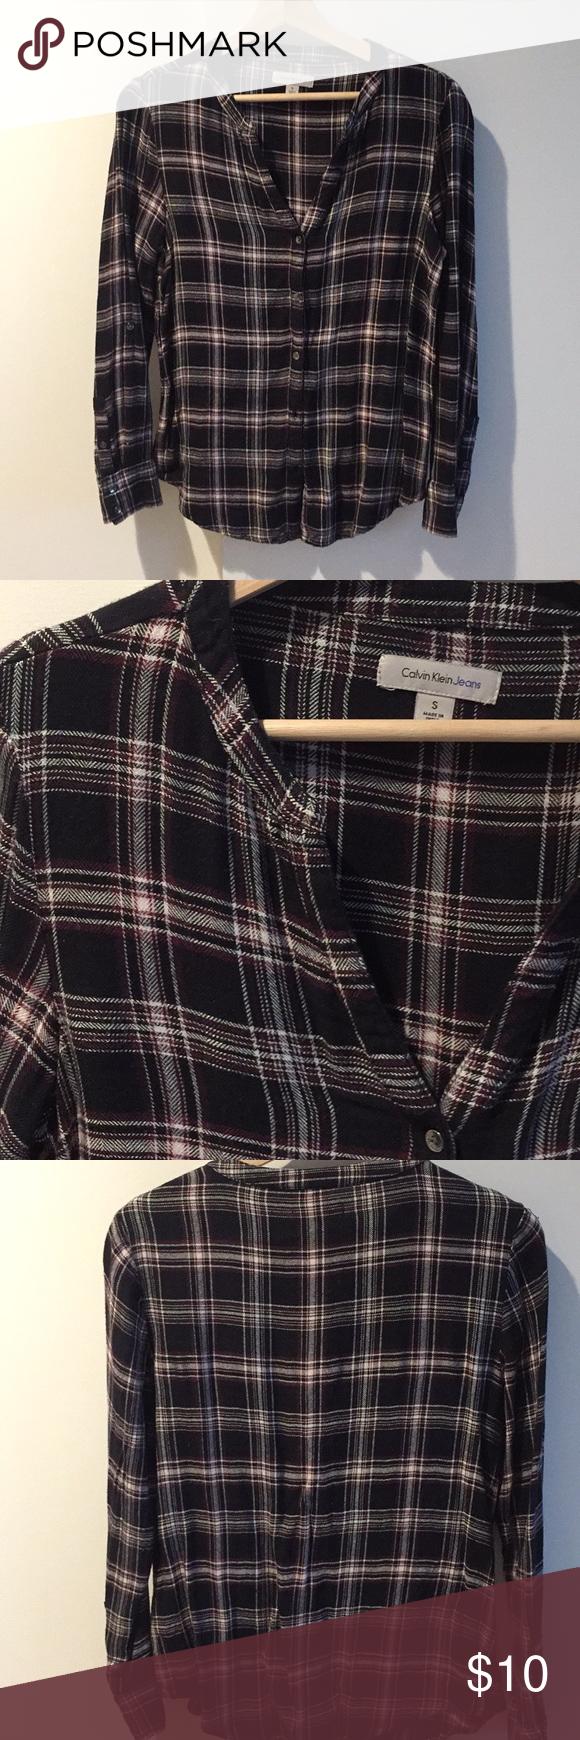 Flannel shirt jeans  Calvin Klein Jeans Flannel shirt sz S  My Posh Picks  Pinterest